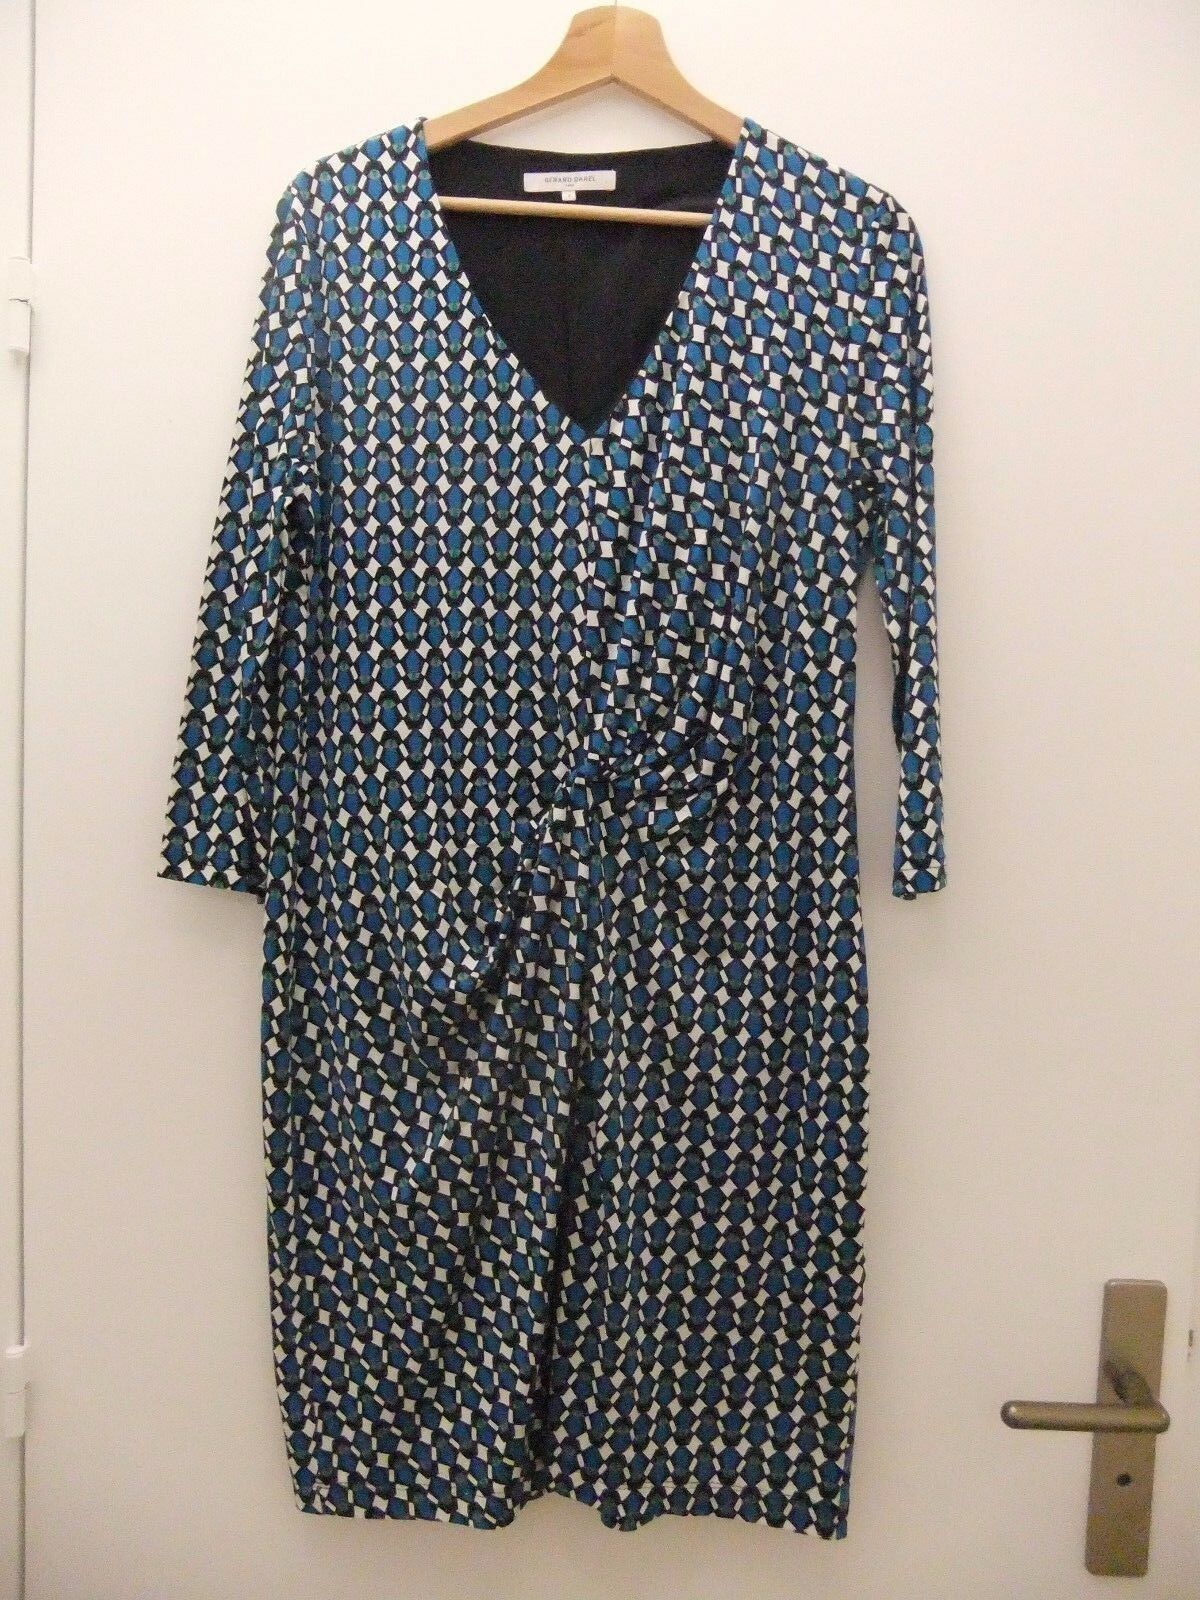 Gérard Darel magnifique magnifique magnifique robe soie Dimensione 3 (40-42)neuve 8dde2e